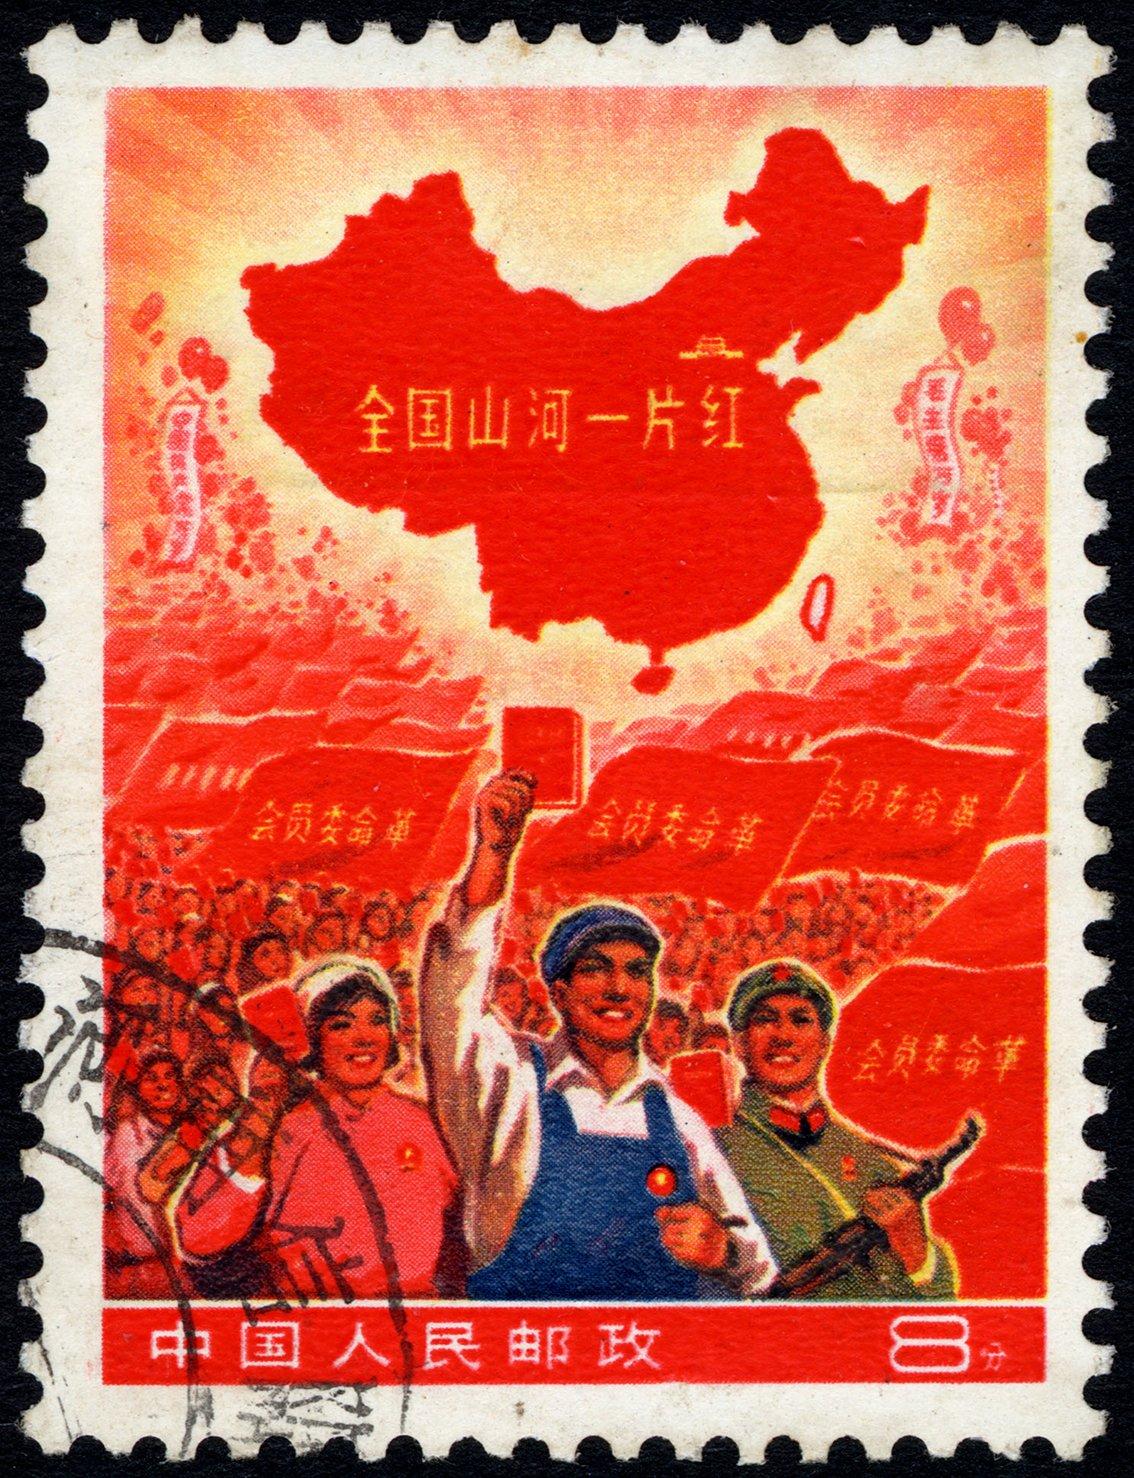 hr_8f_map_of_china_with_design_error_single_china_1968_6052090408068.jpg